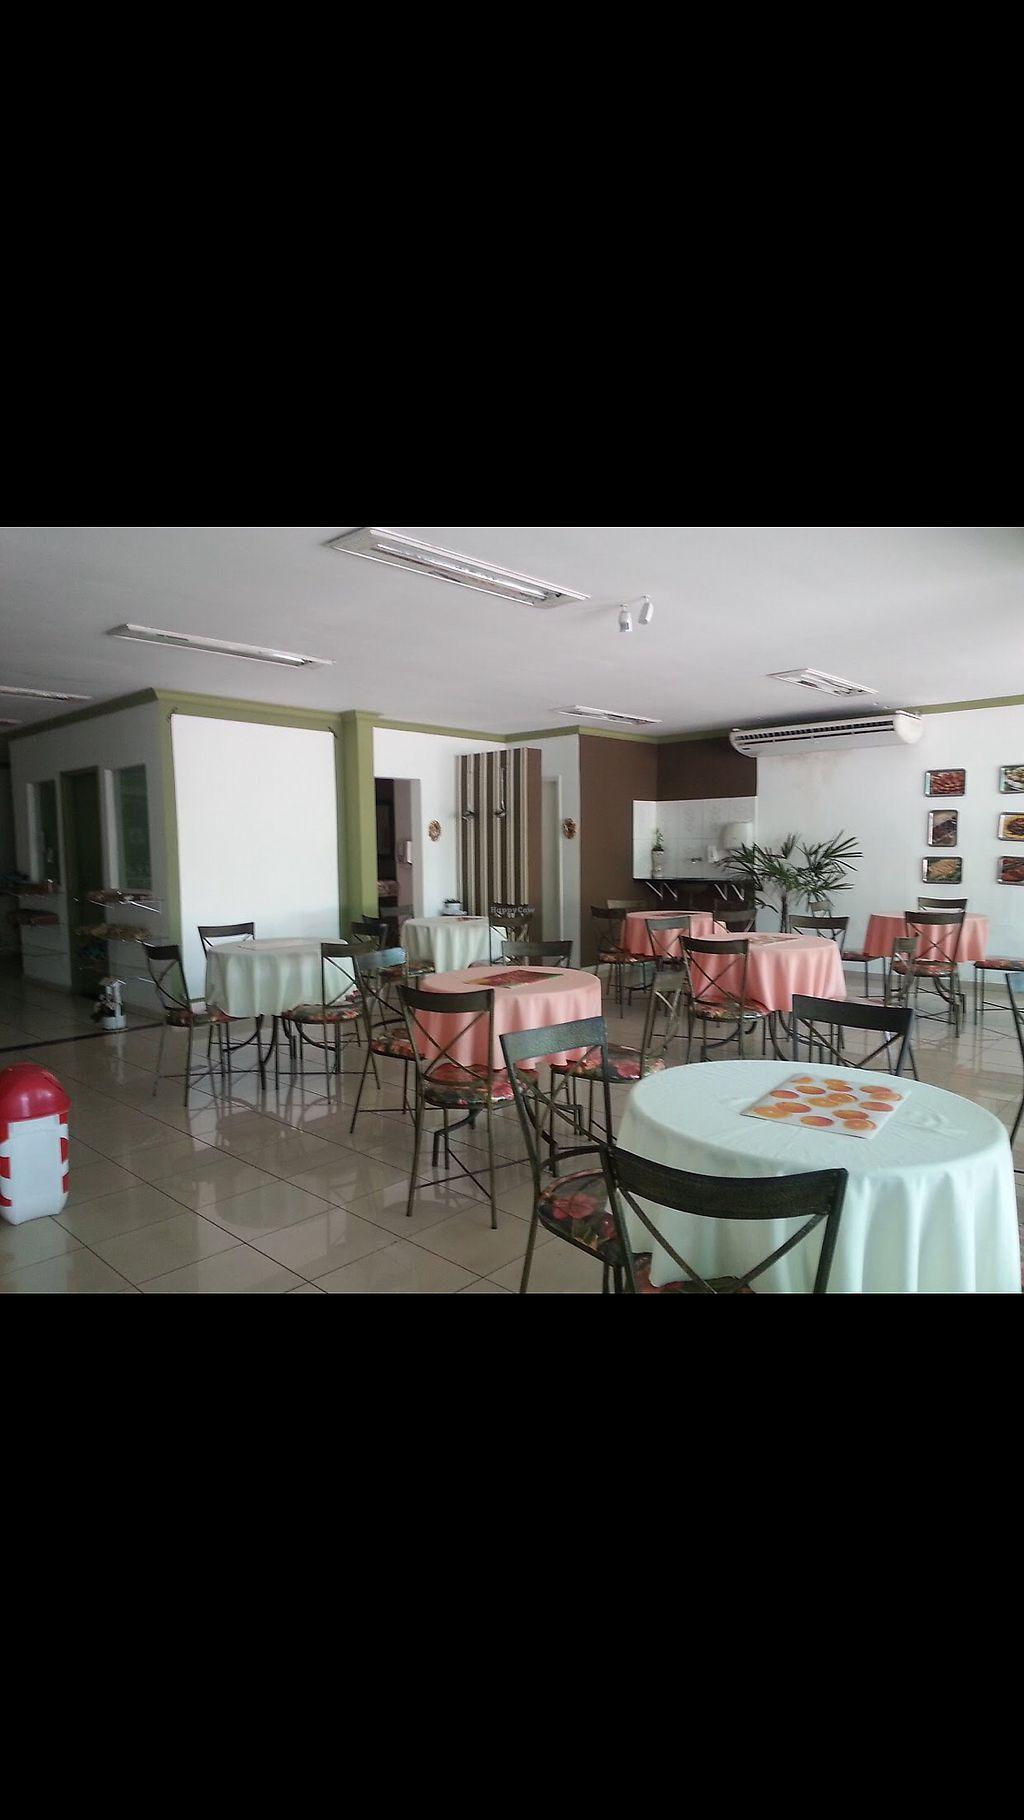 "Photo of Ki-Nutre  by <a href=""/members/profile/PedroFelipe"">PedroFelipe</a> <br/>Restaurant <br/> July 22, 2017  - <a href='/contact/abuse/image/48325/283245'>Report</a>"